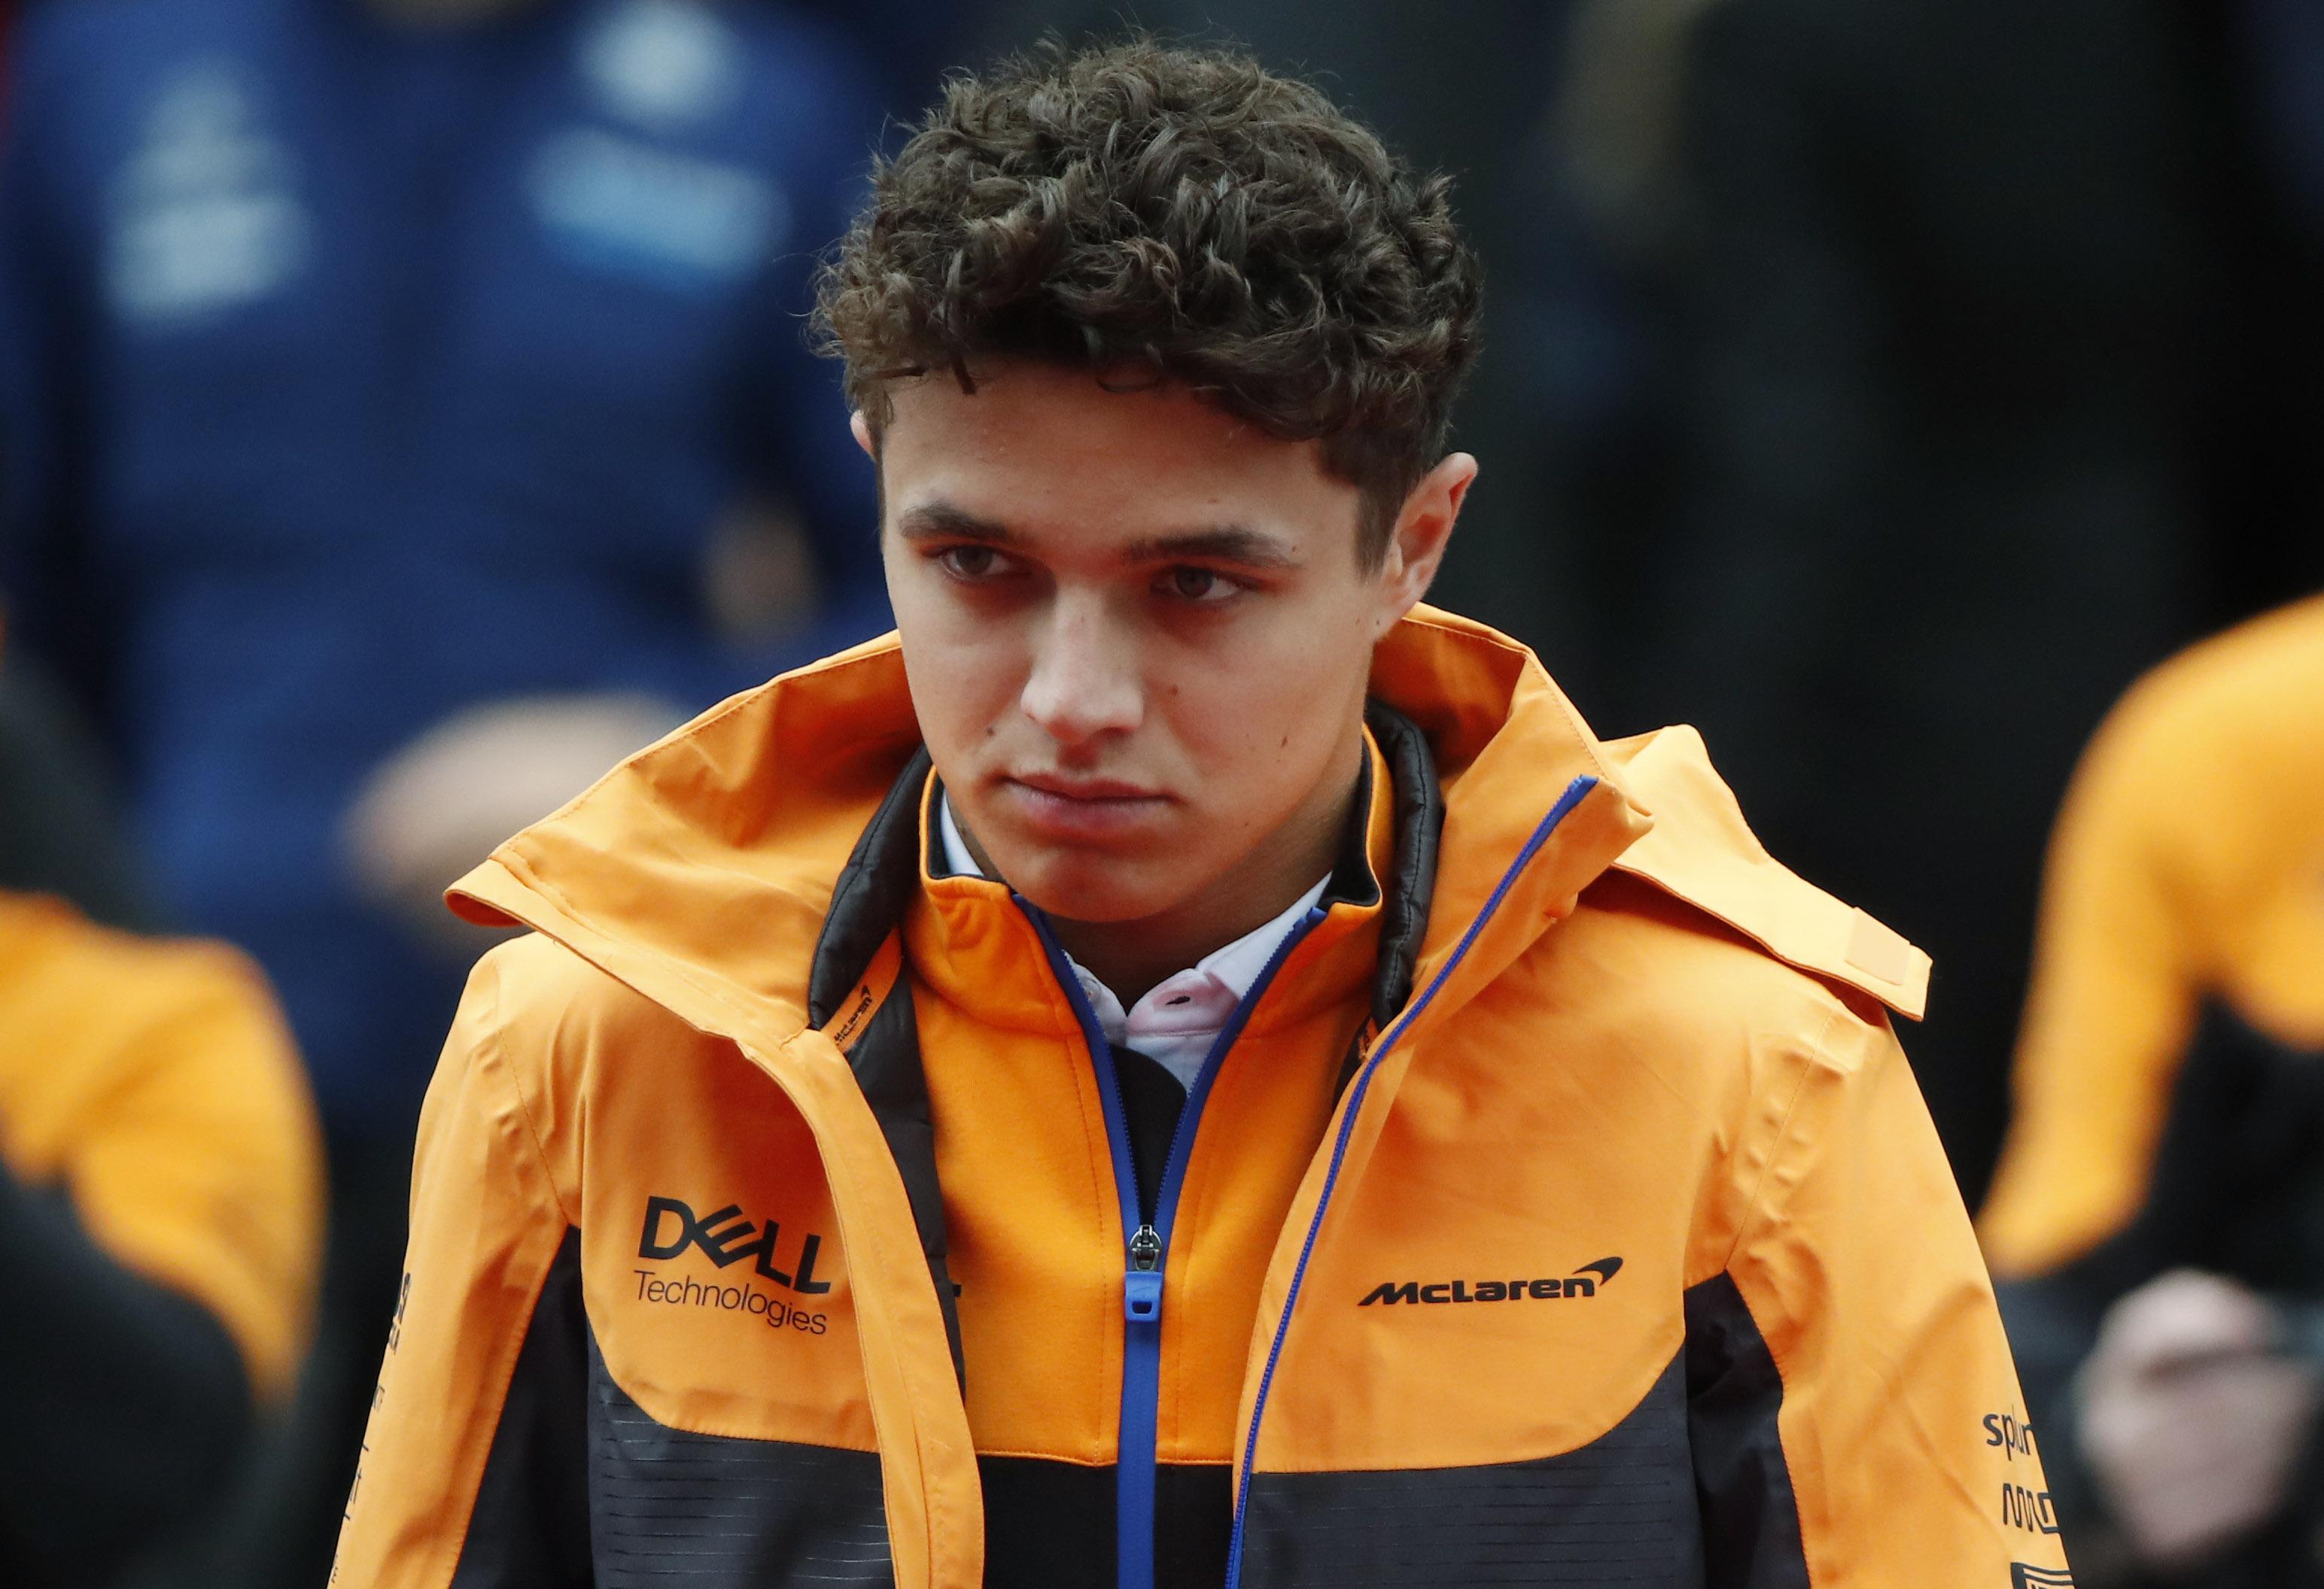 FILE PHOTO-Formula One F1 - Russian Grand Prix - Sochi Autodrom, Sochi, Russia - September 26, 2021 McLaren's Lando Norris is seen before the race REUTERS/Maxim Shemetov